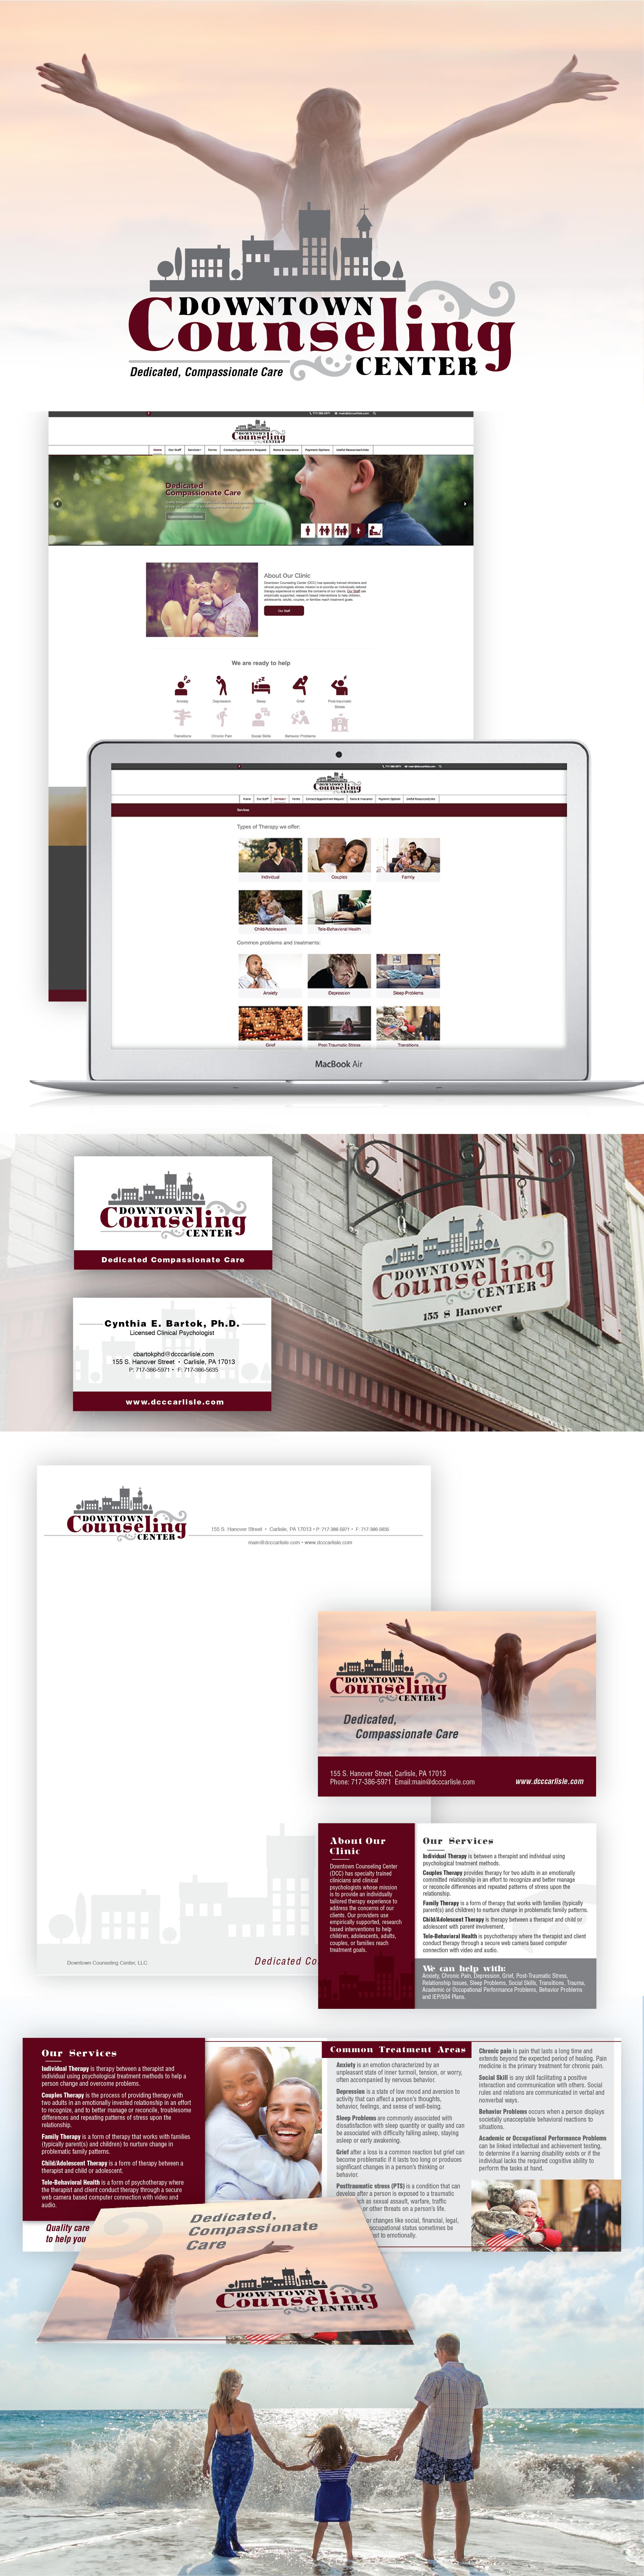 Downtown Counceling Center Portfolio